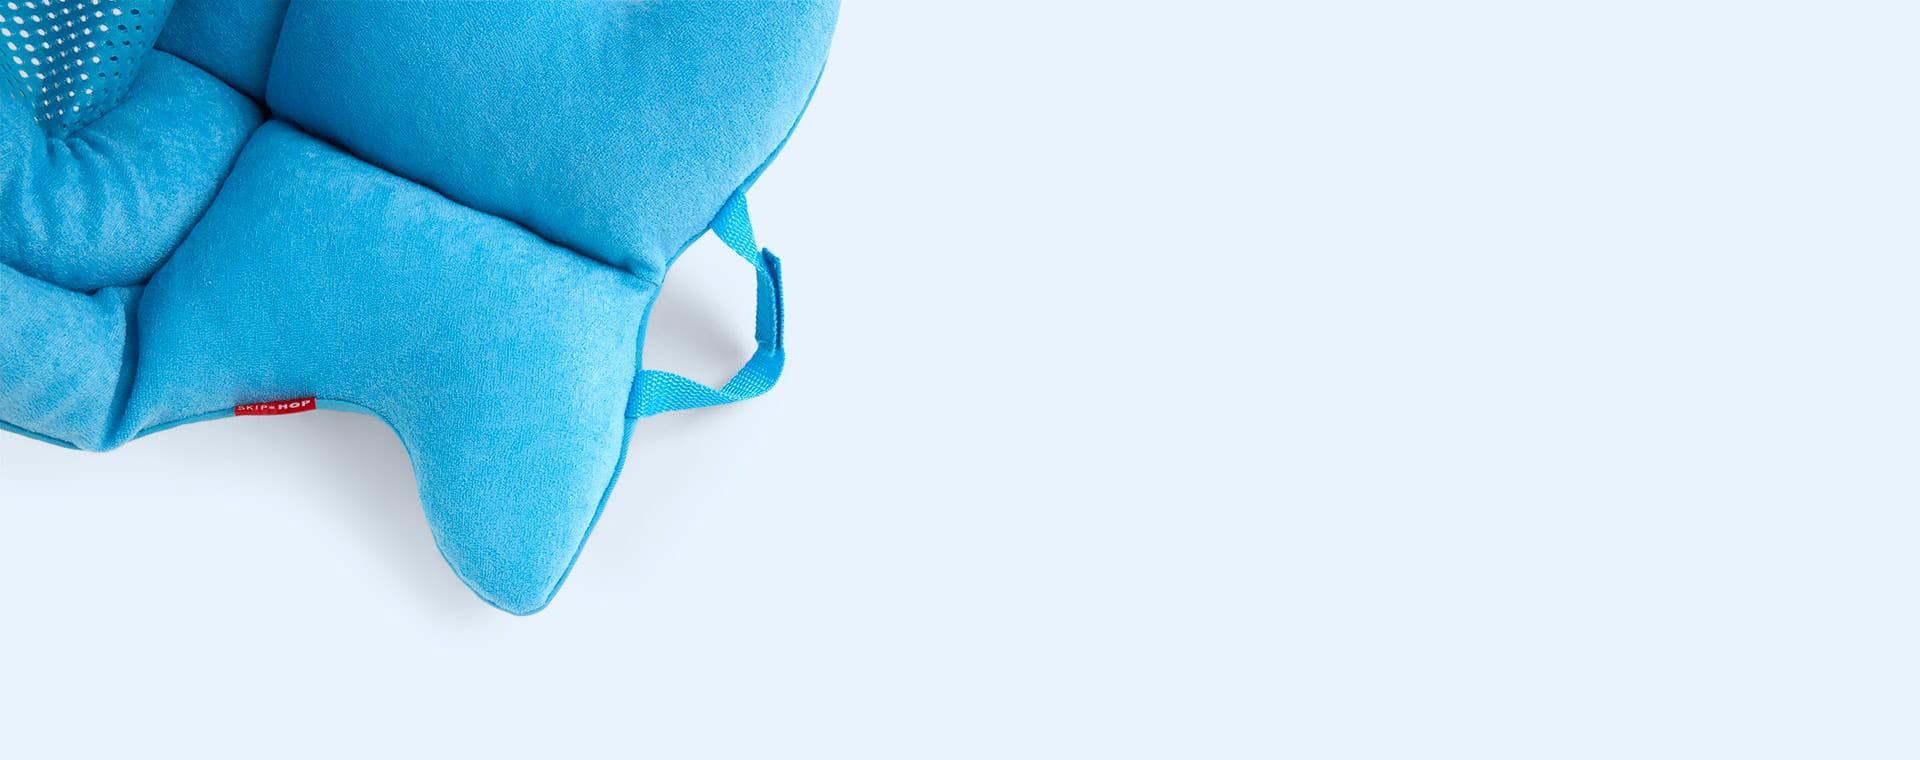 Blue Skip Hop Moby Softspot Sink Bather